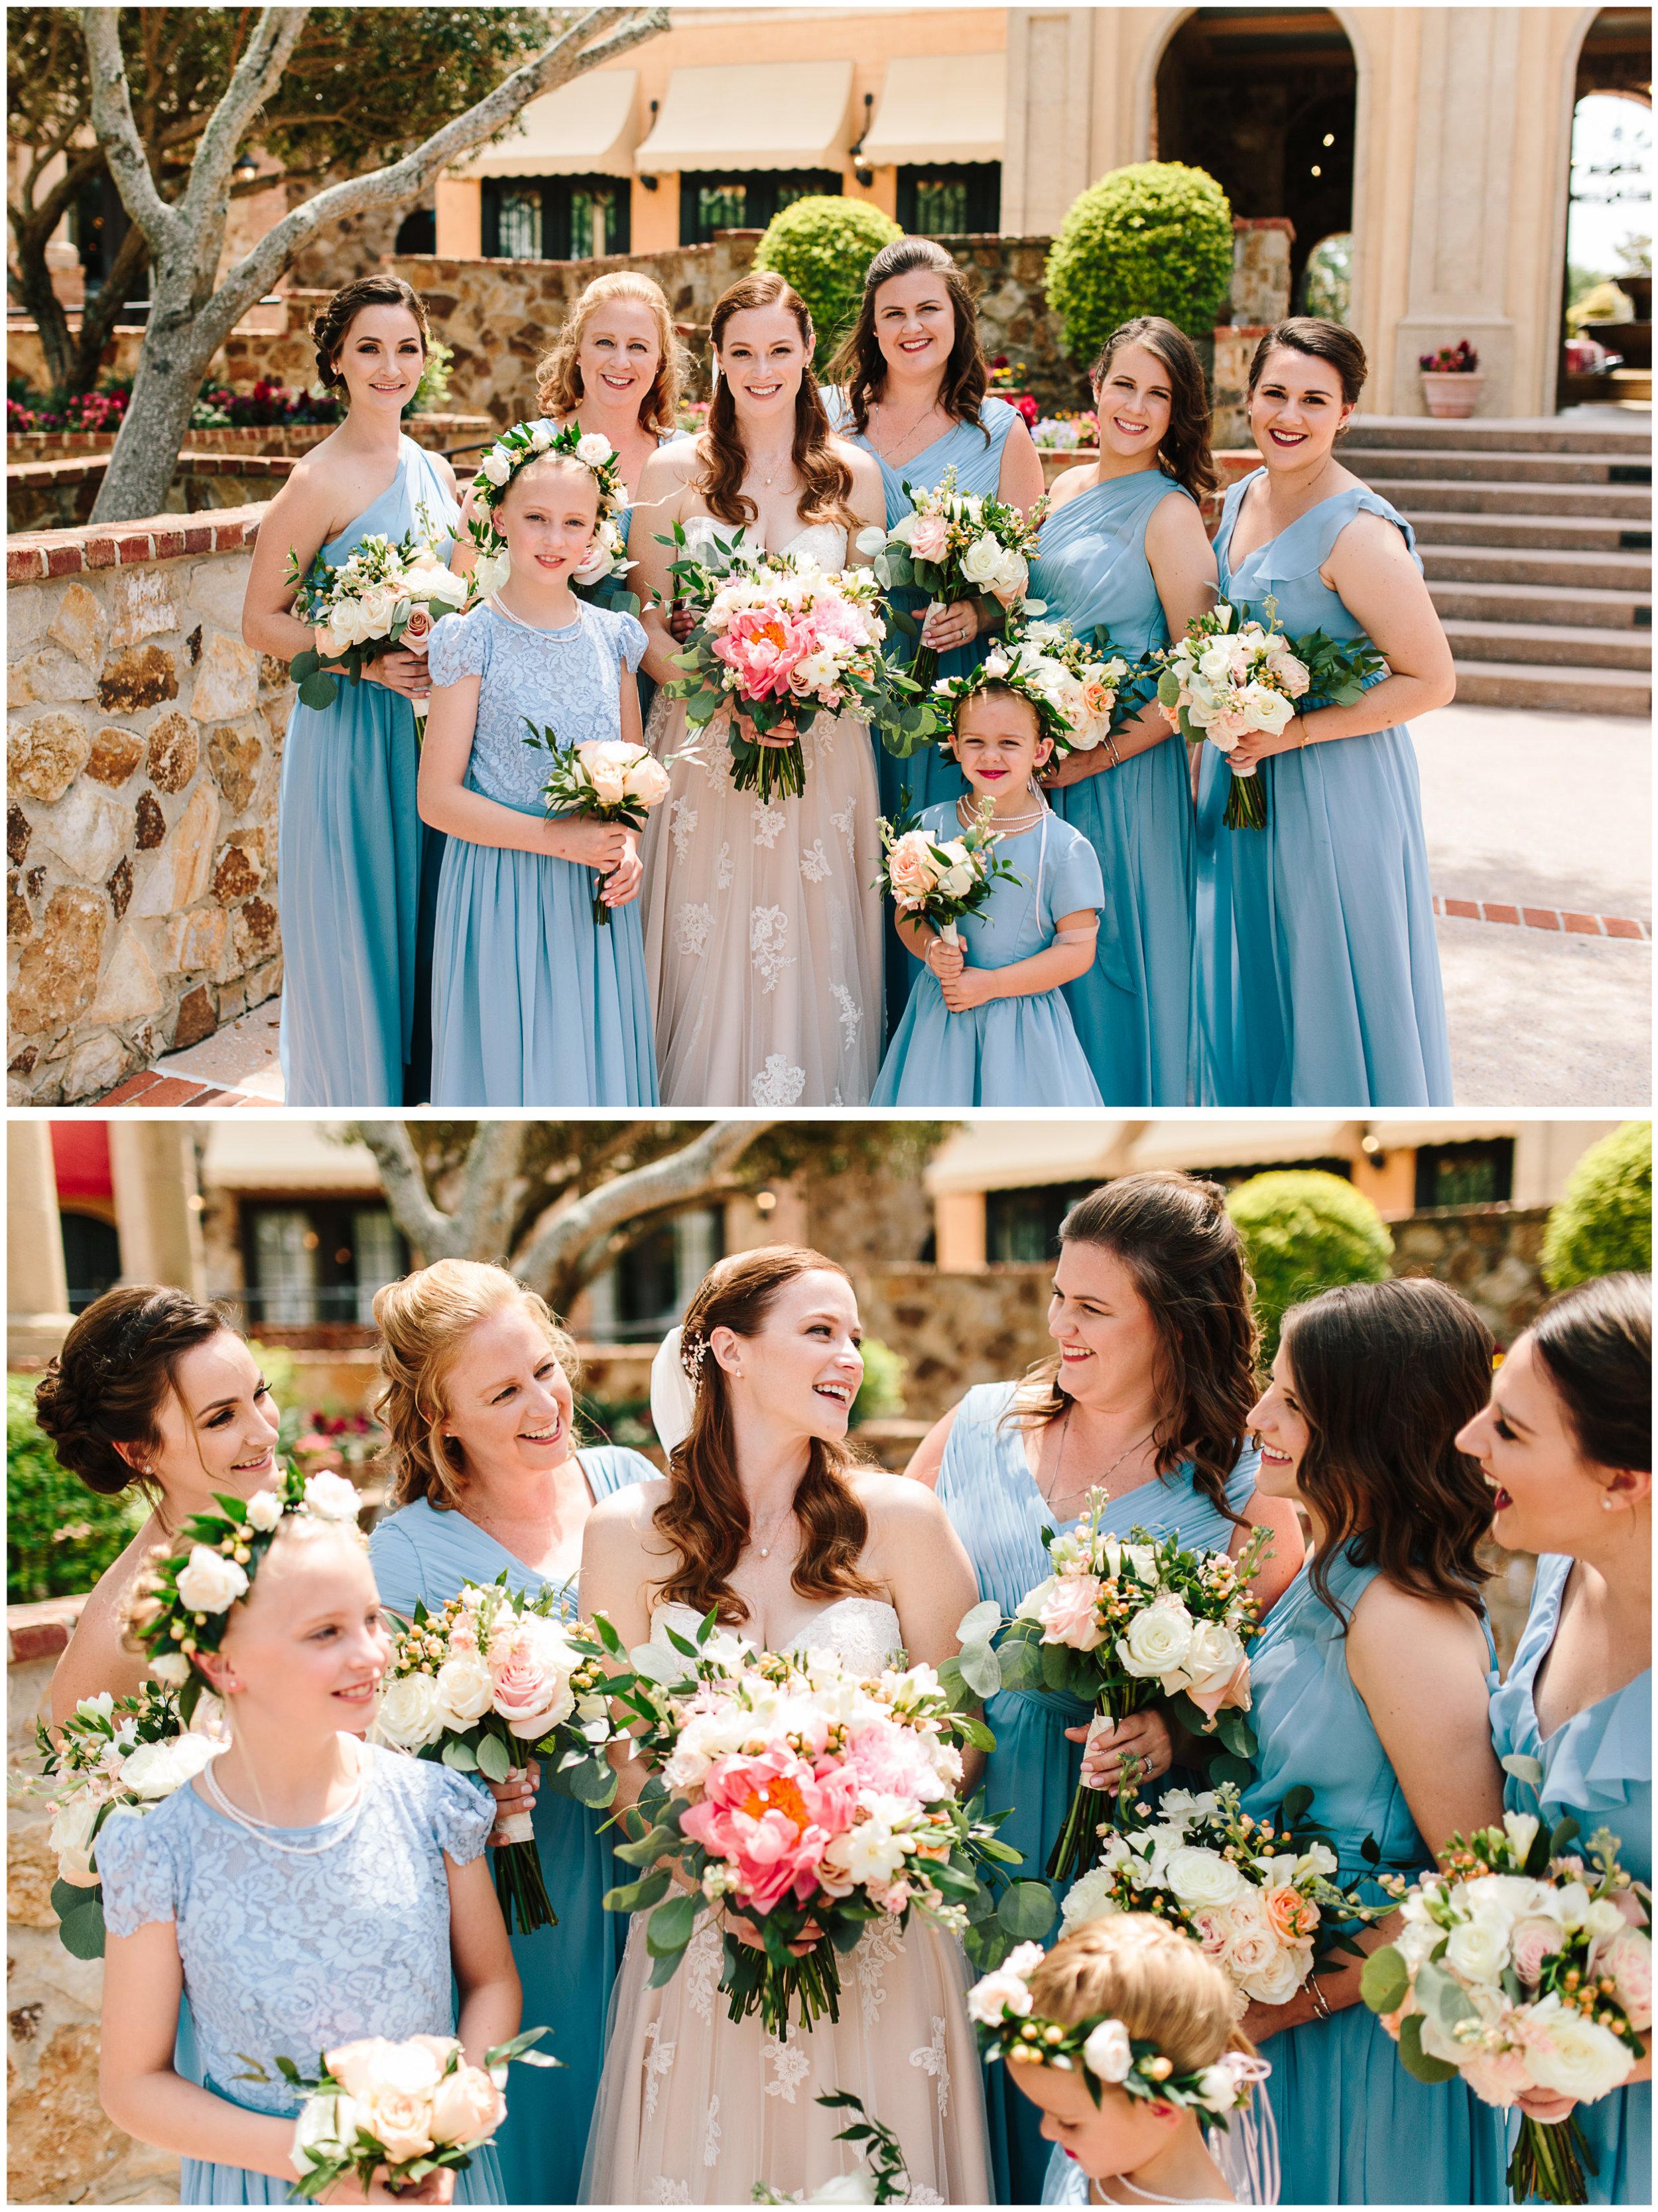 bella_collina_wedding_49.jpg